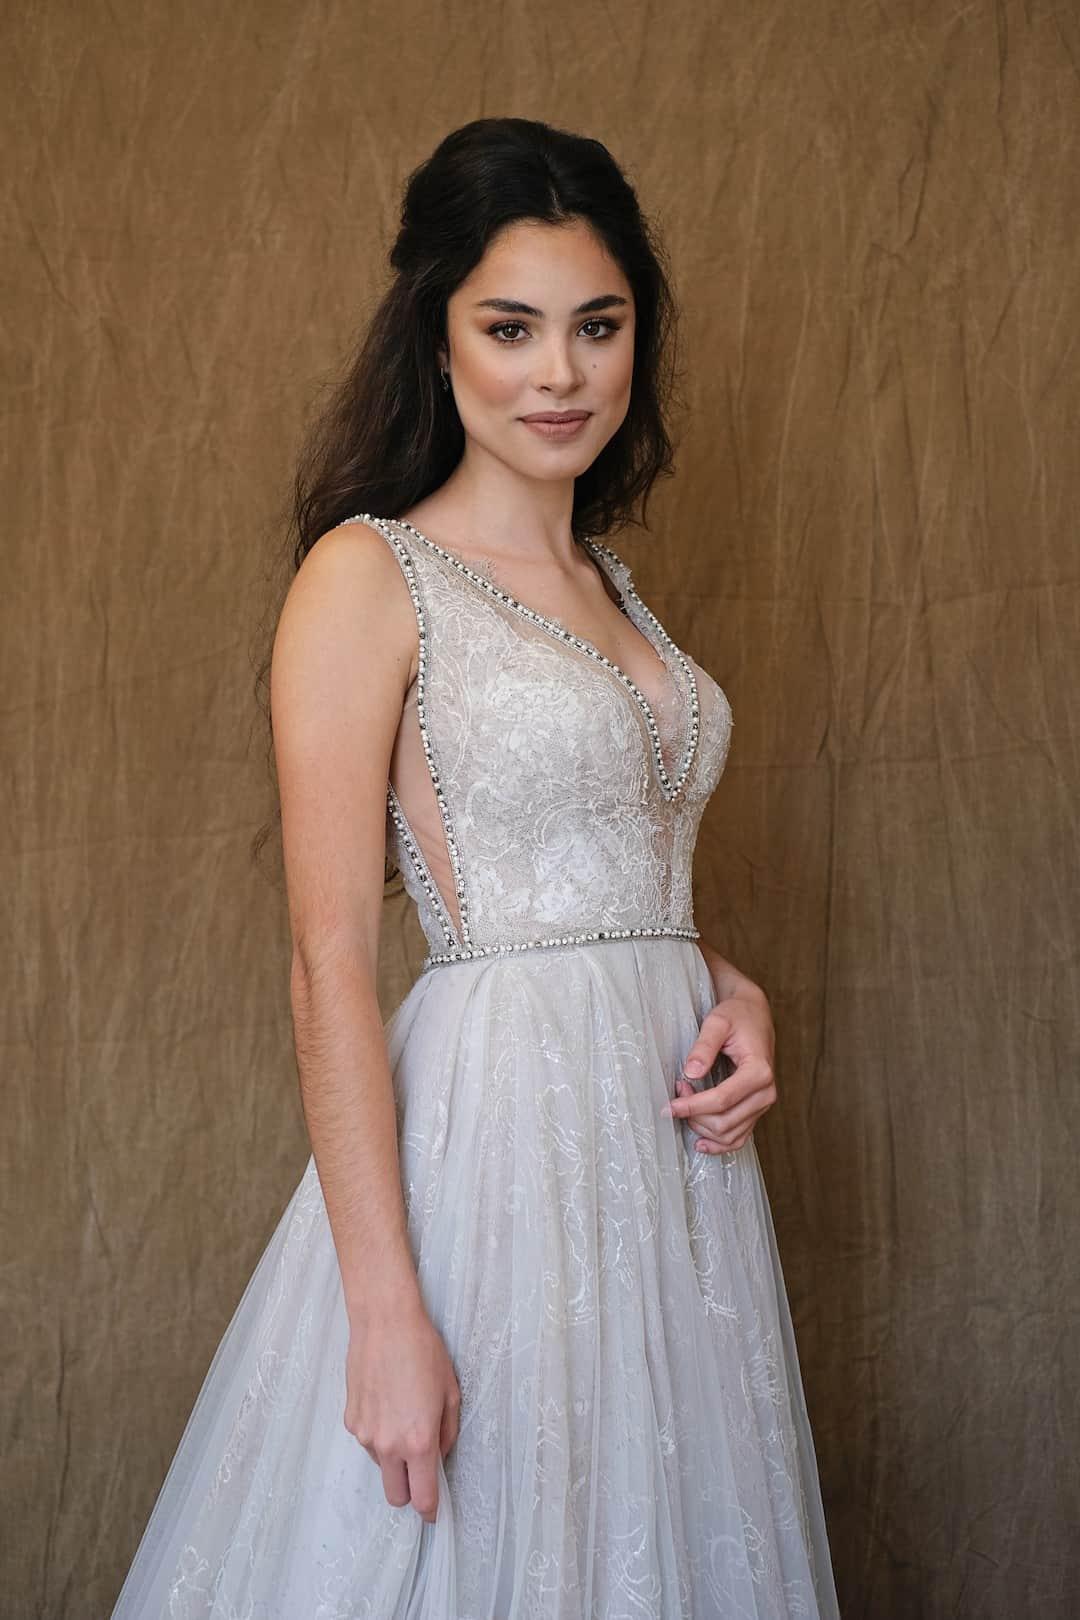 Haute Couture Eskuvoi Ruhak - Galia Lahav - Gala 711 - front_top